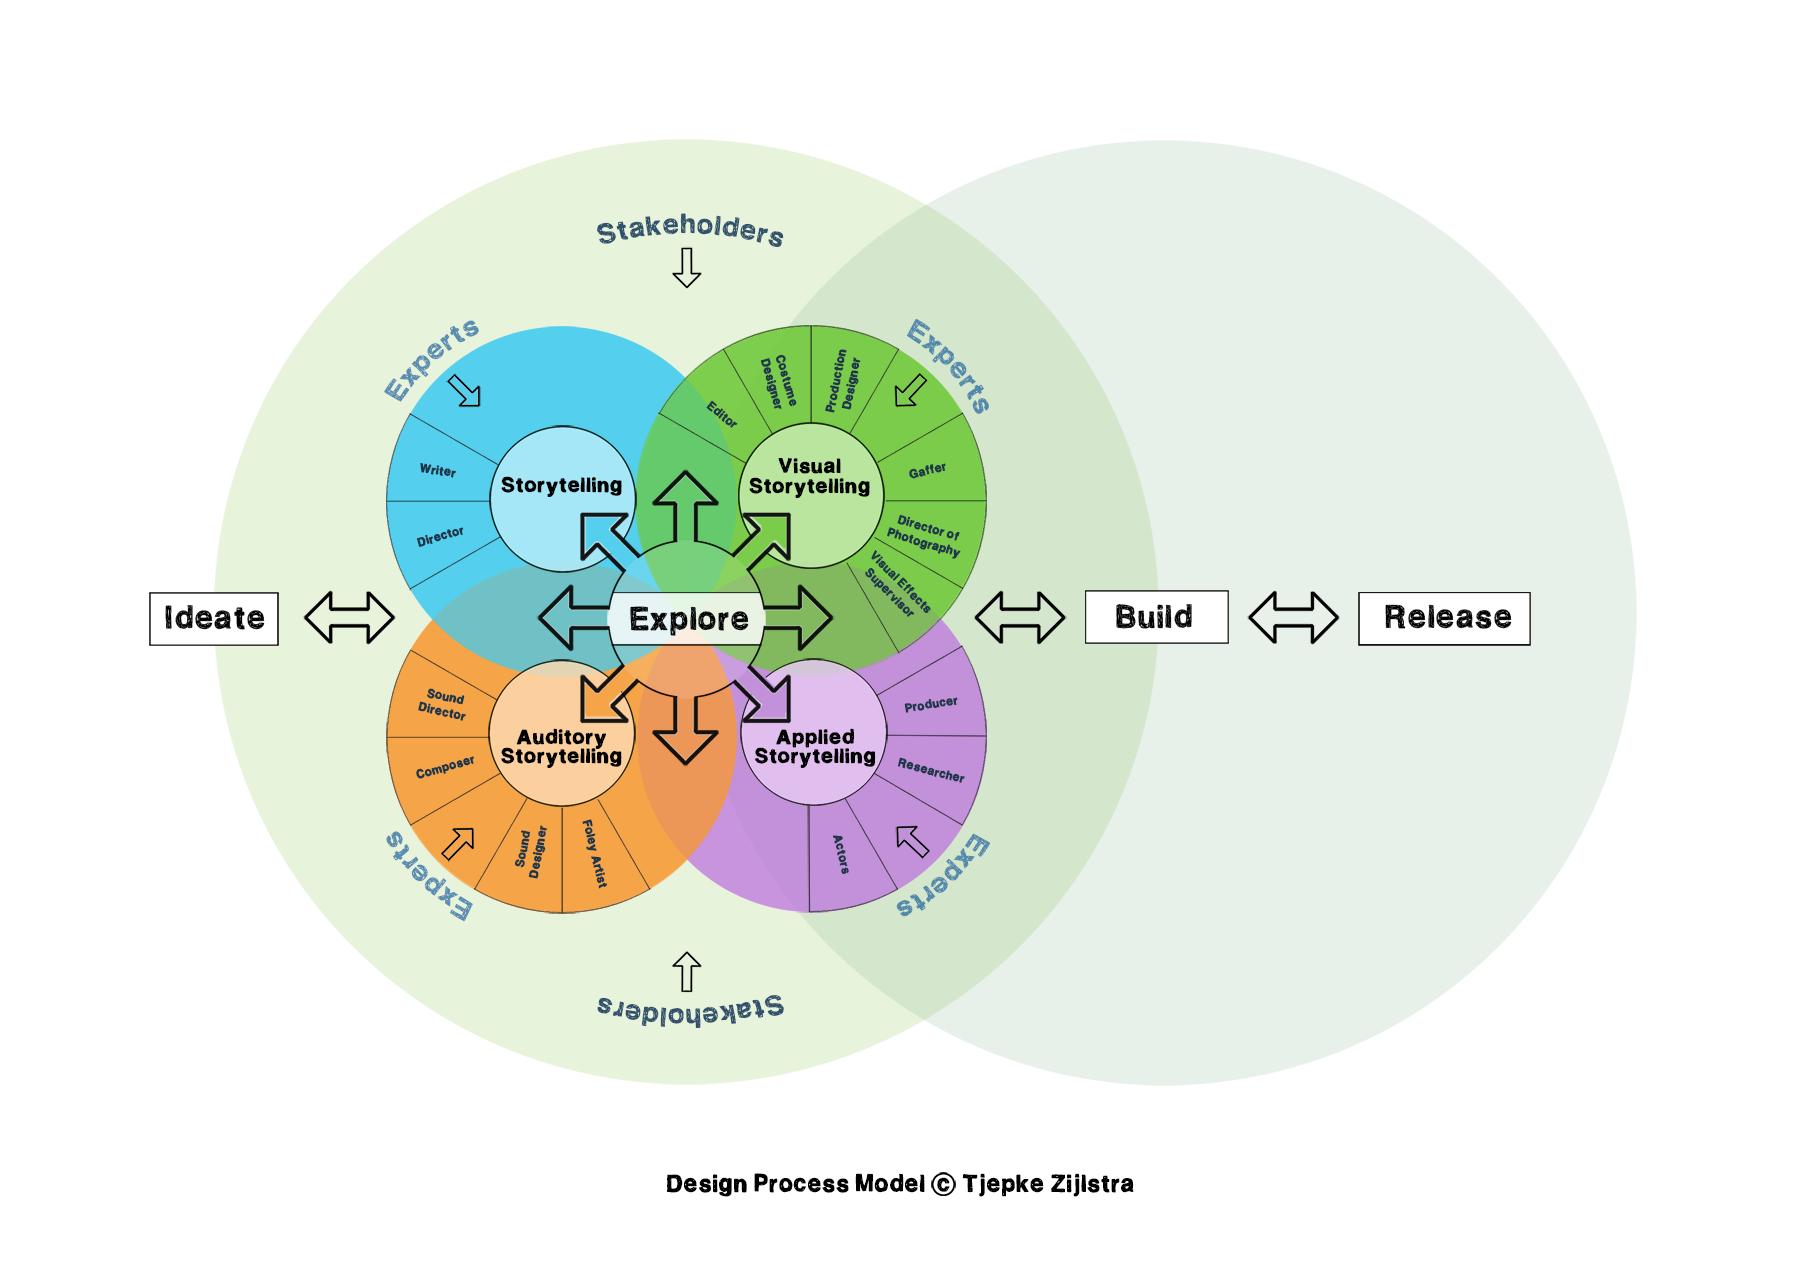 Design_Process_Model_[Film]_(Zijlstra)